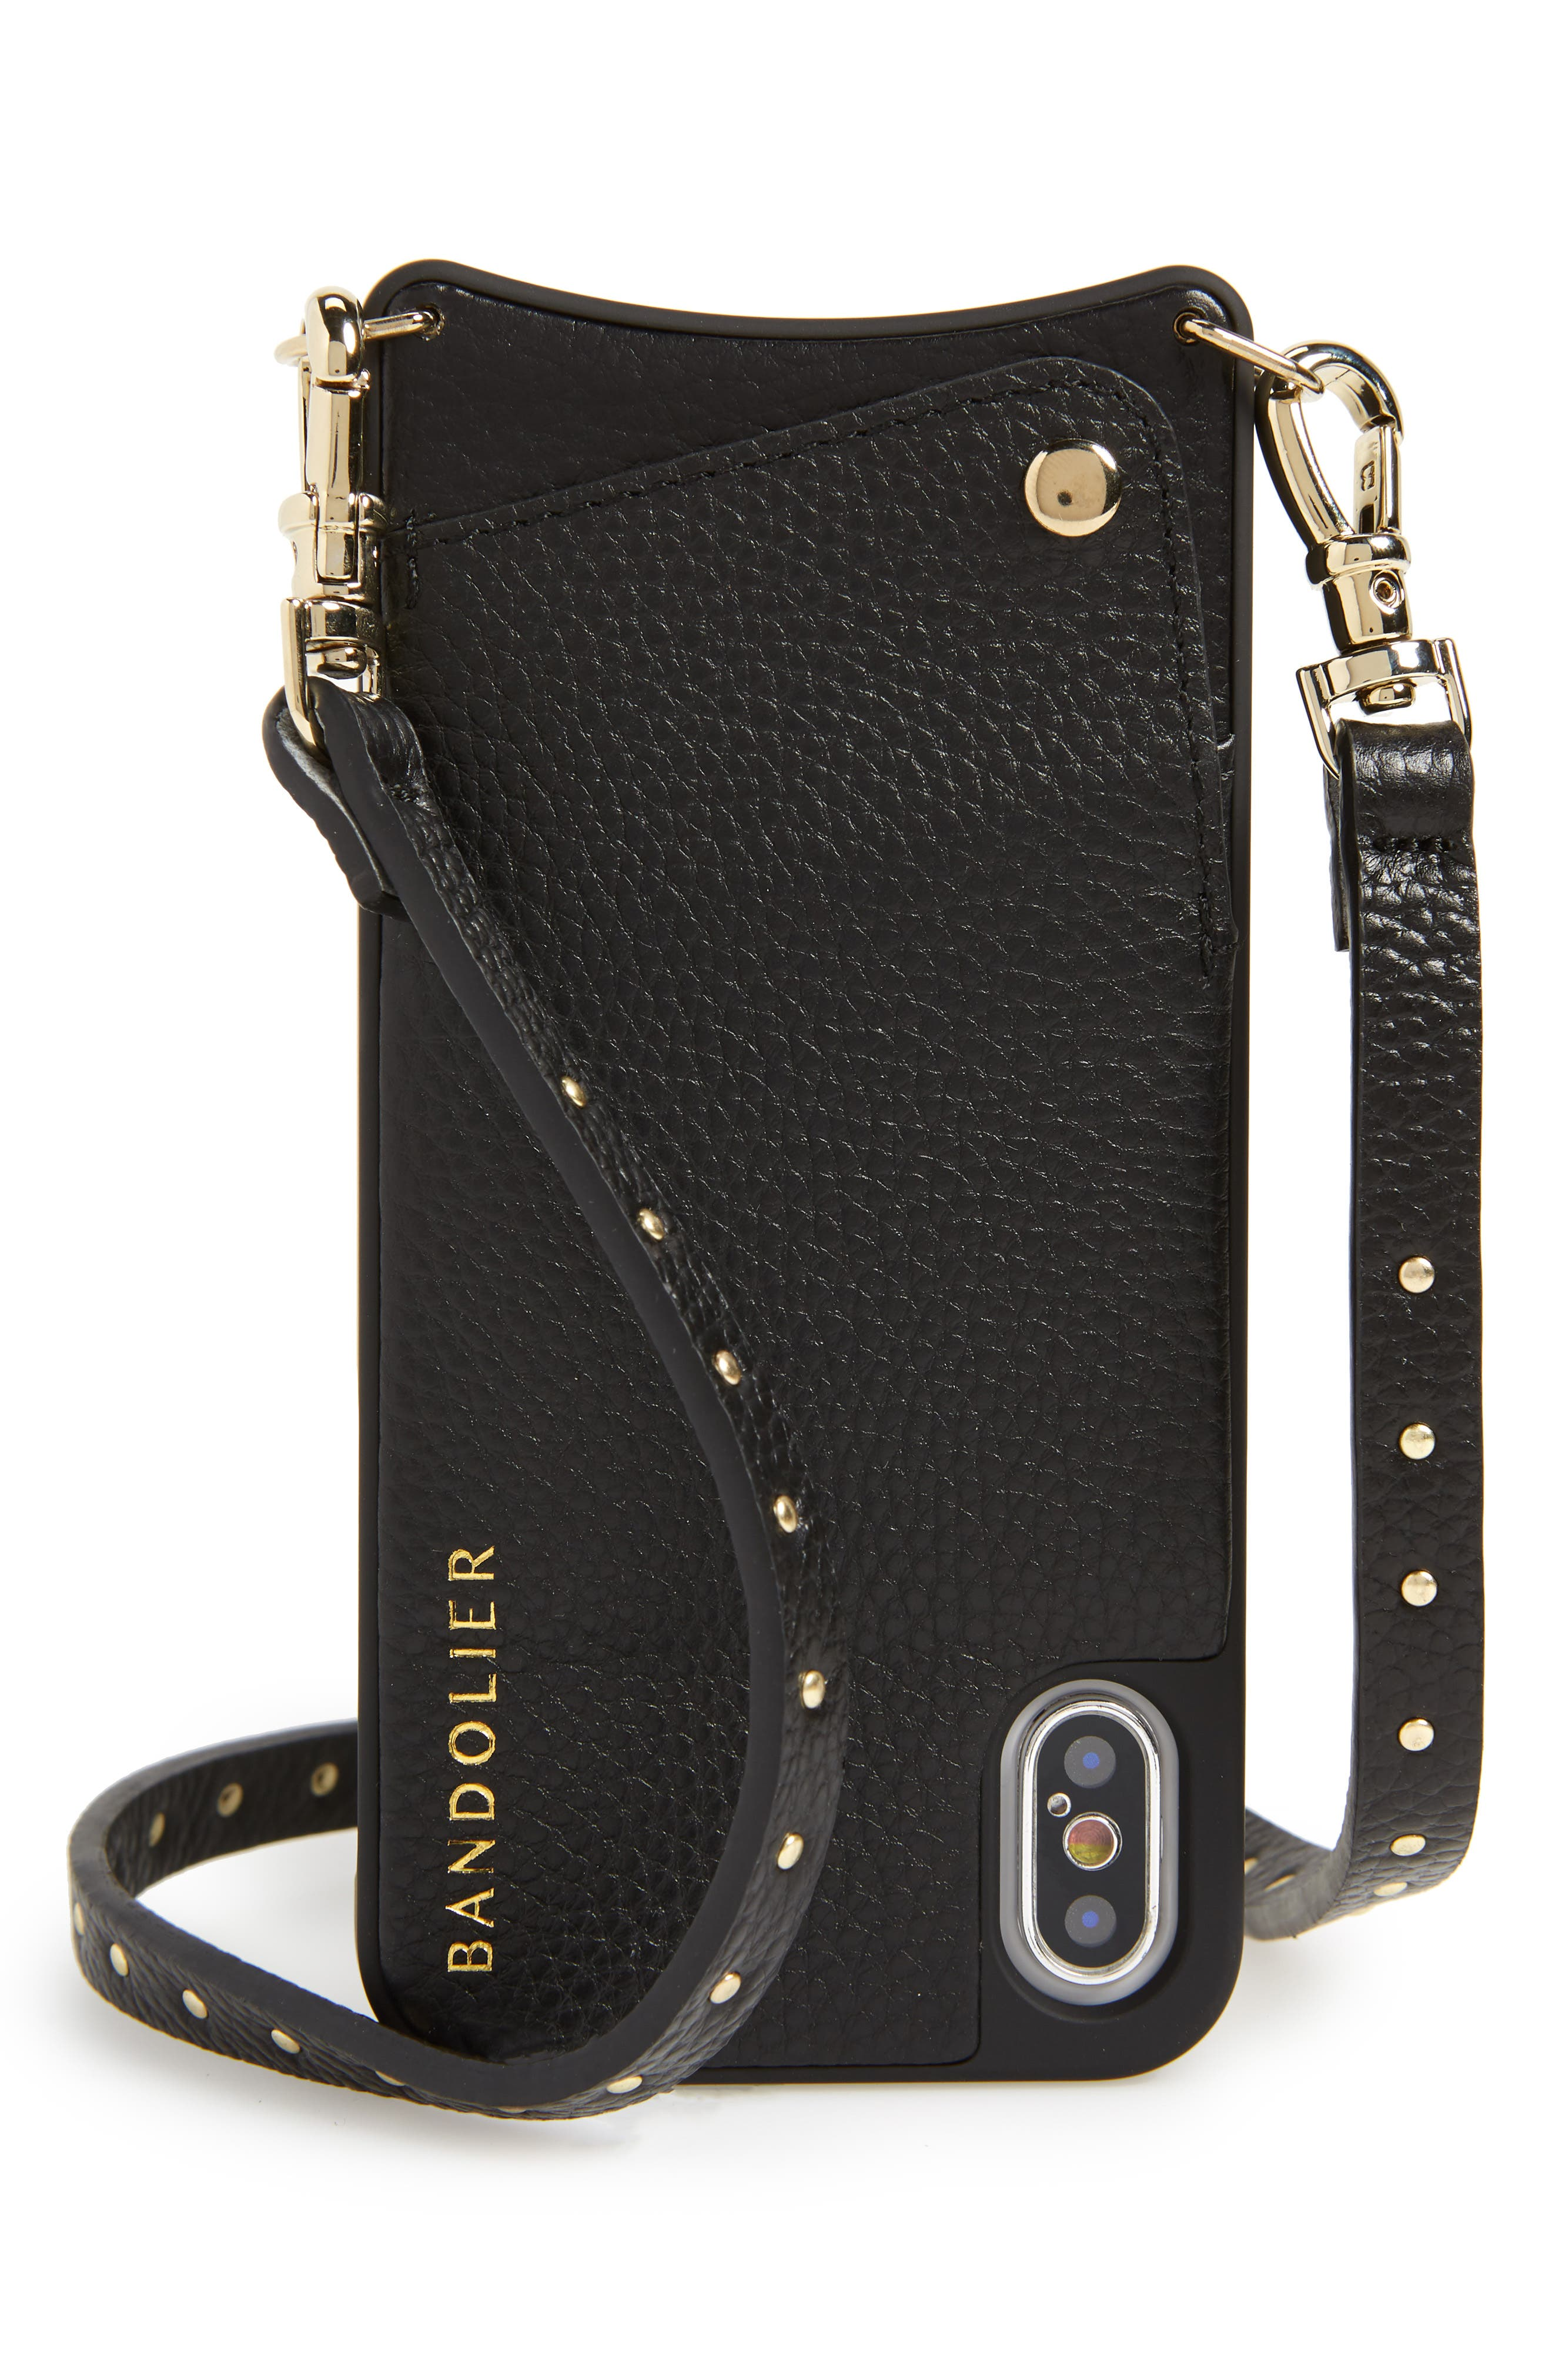 BANDOLIER Nicole Pebbled Leather 6/7/8 & 6/7/8 Plus Crossbody Case, Main, color, BLACK/ GOLD